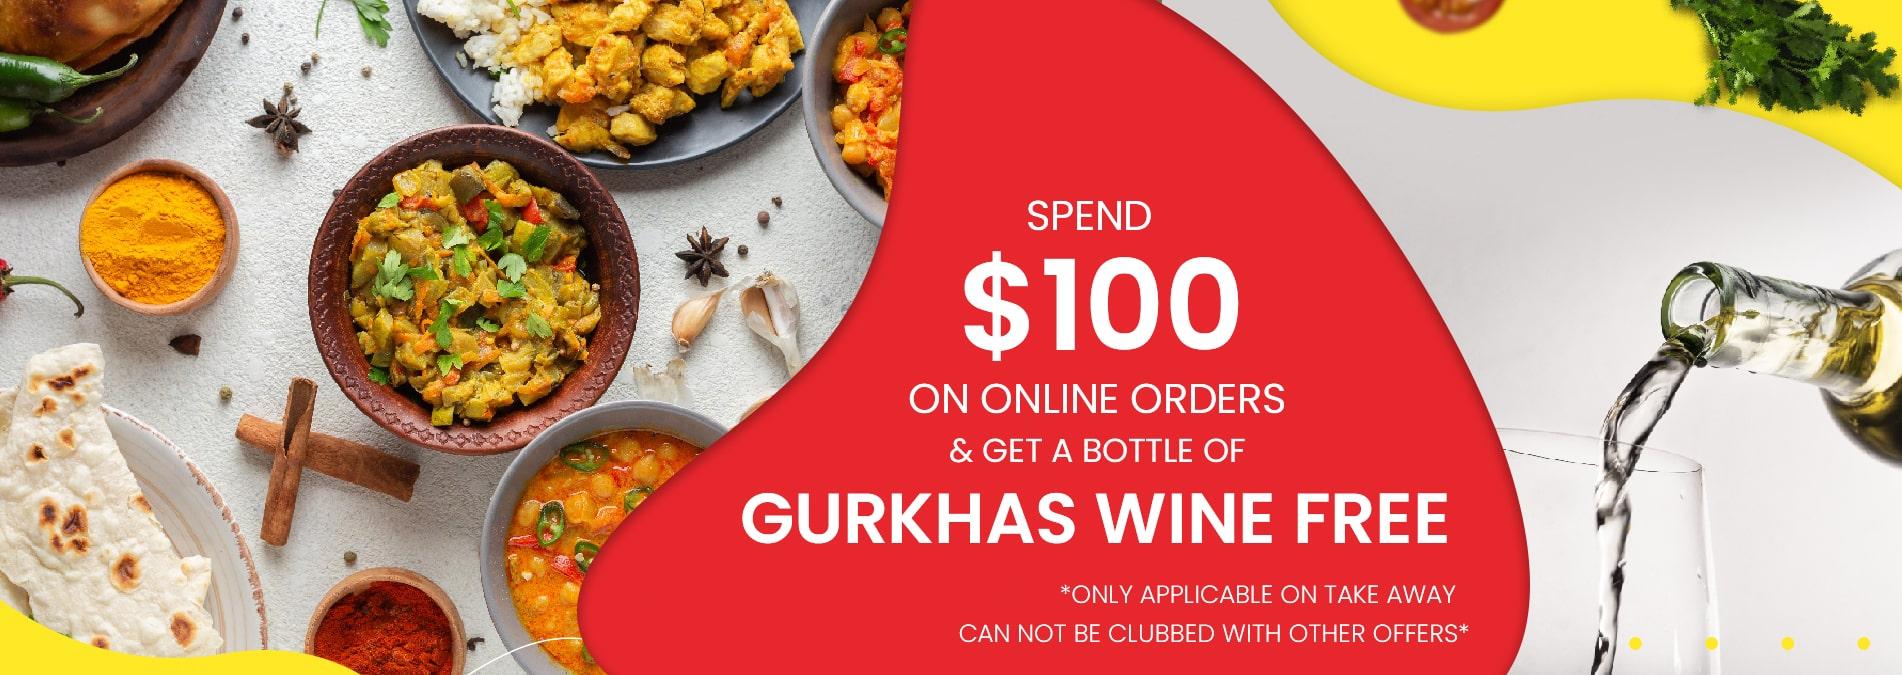 Takeaway from Restaurants and Get Gurkhas Wine Free